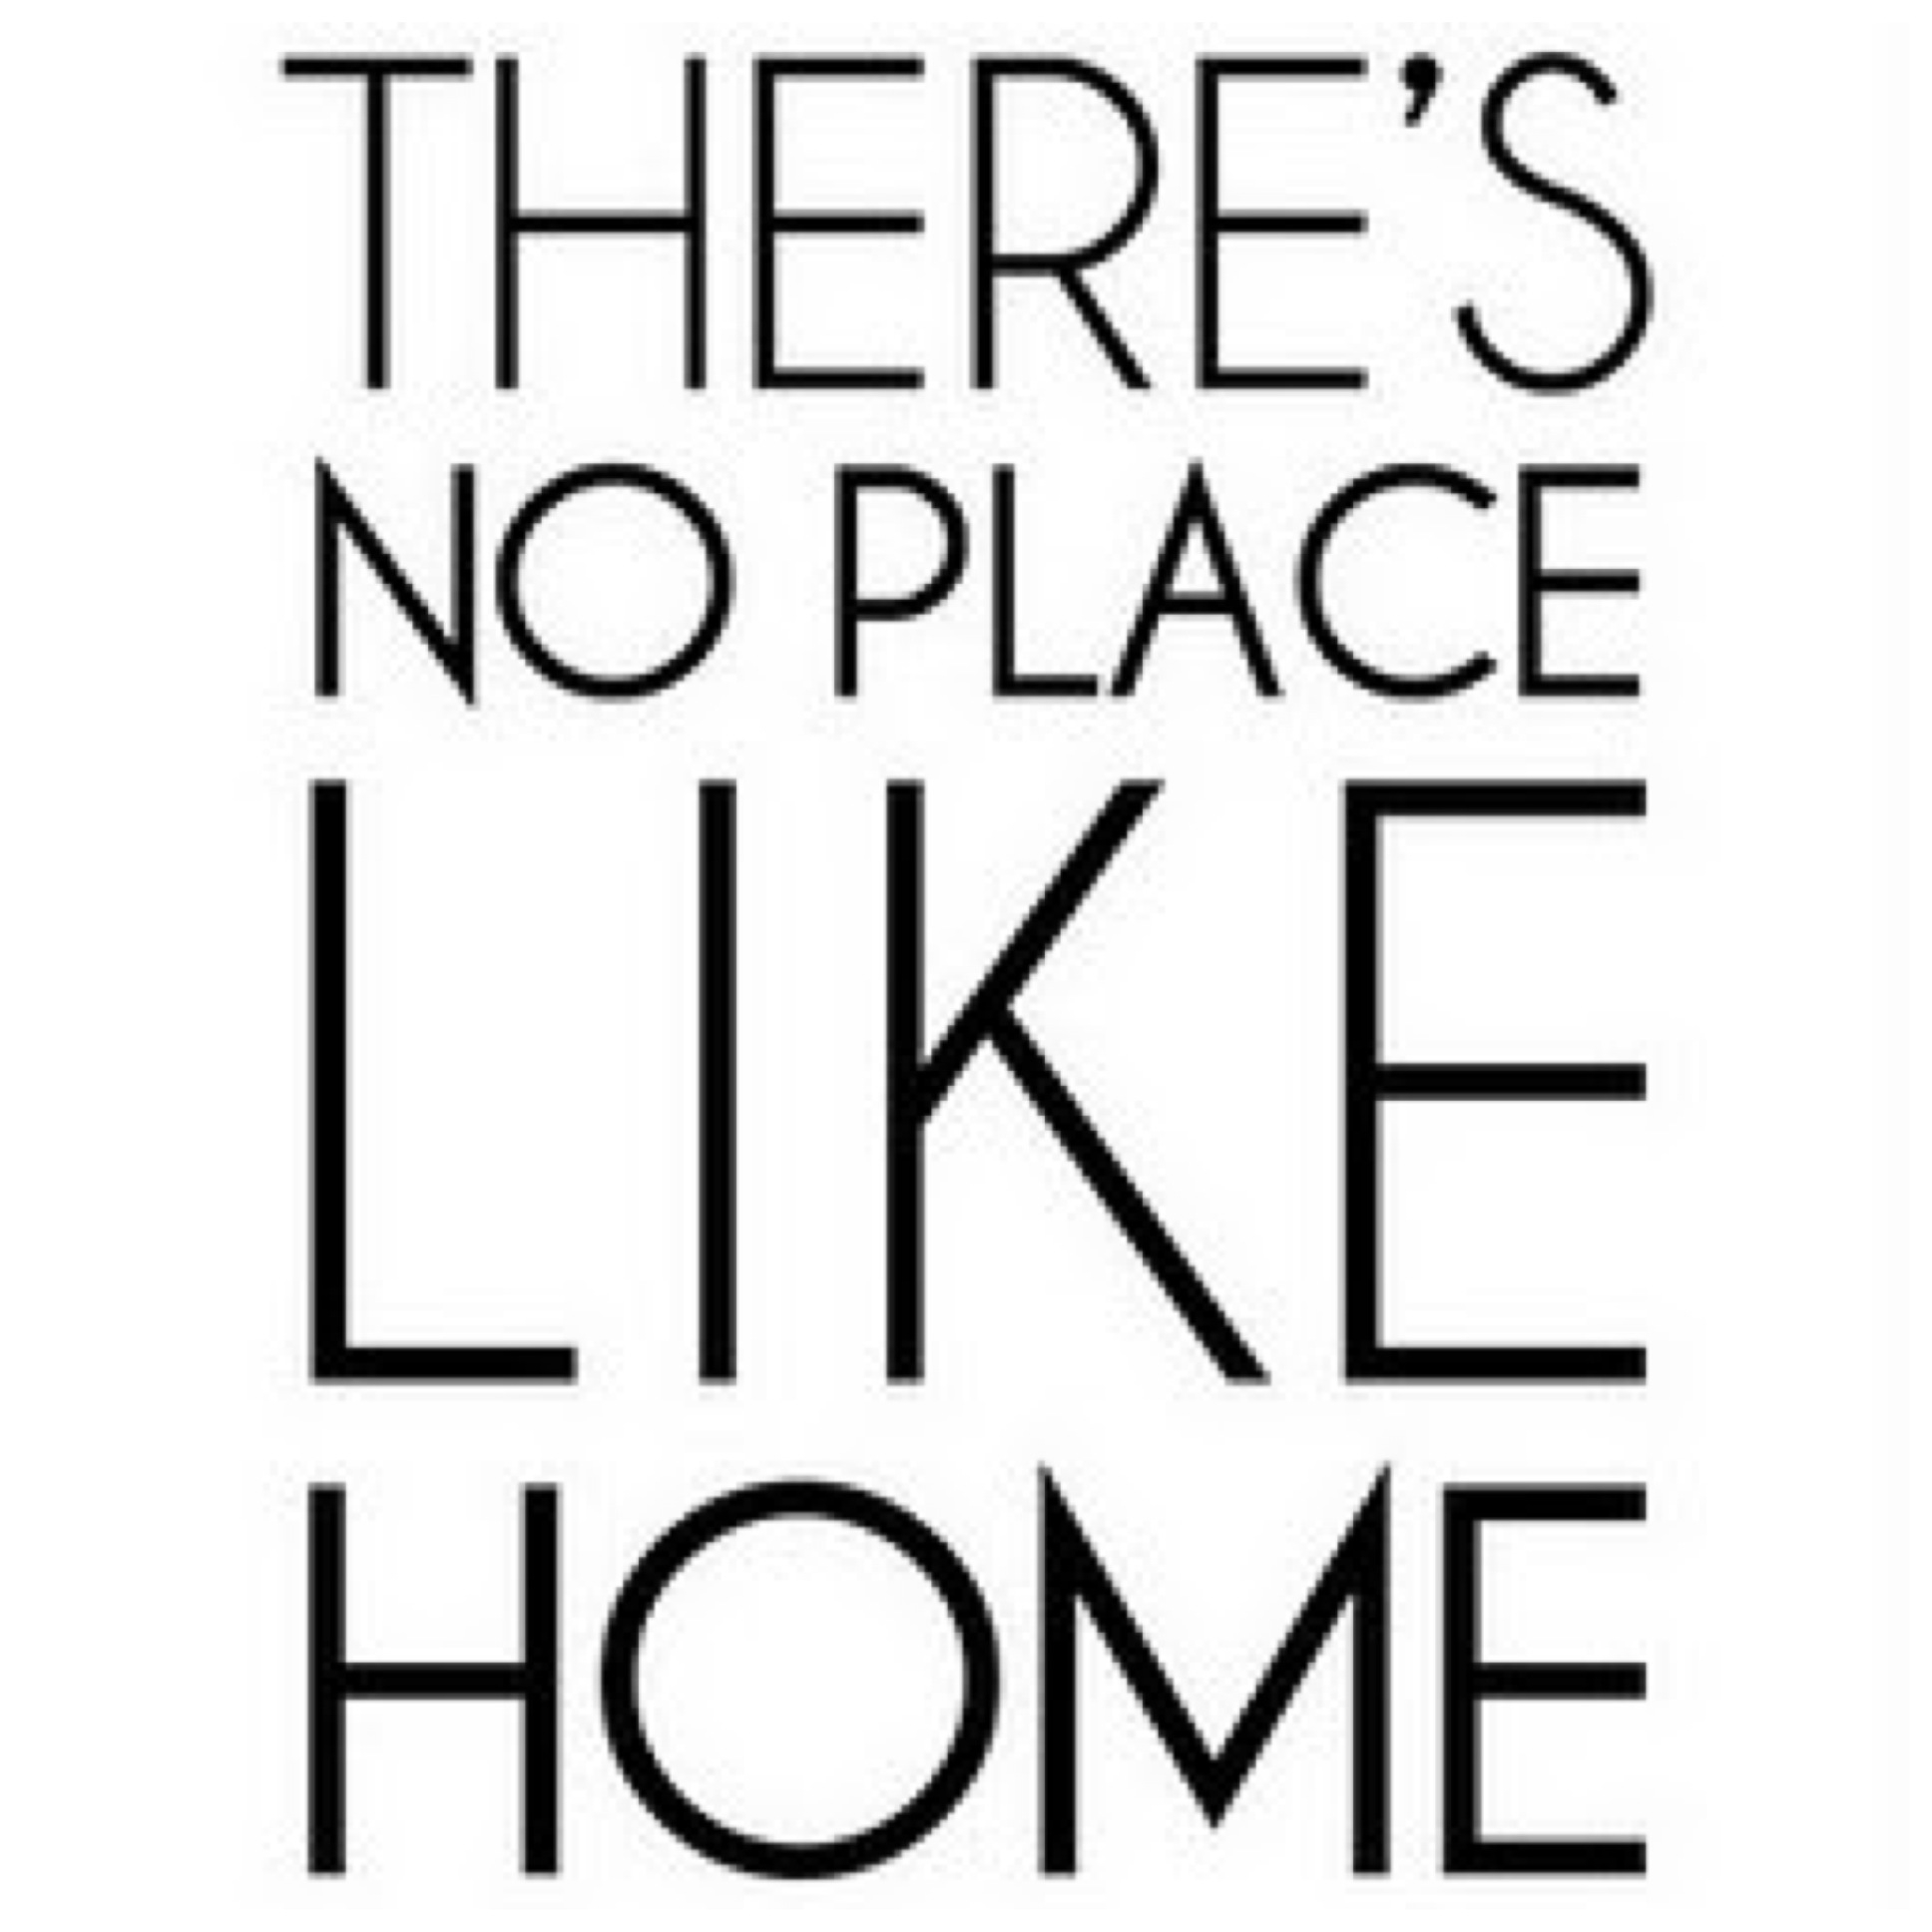 Women And Home Home Sweet Home 5x7 Autumn Housewarming